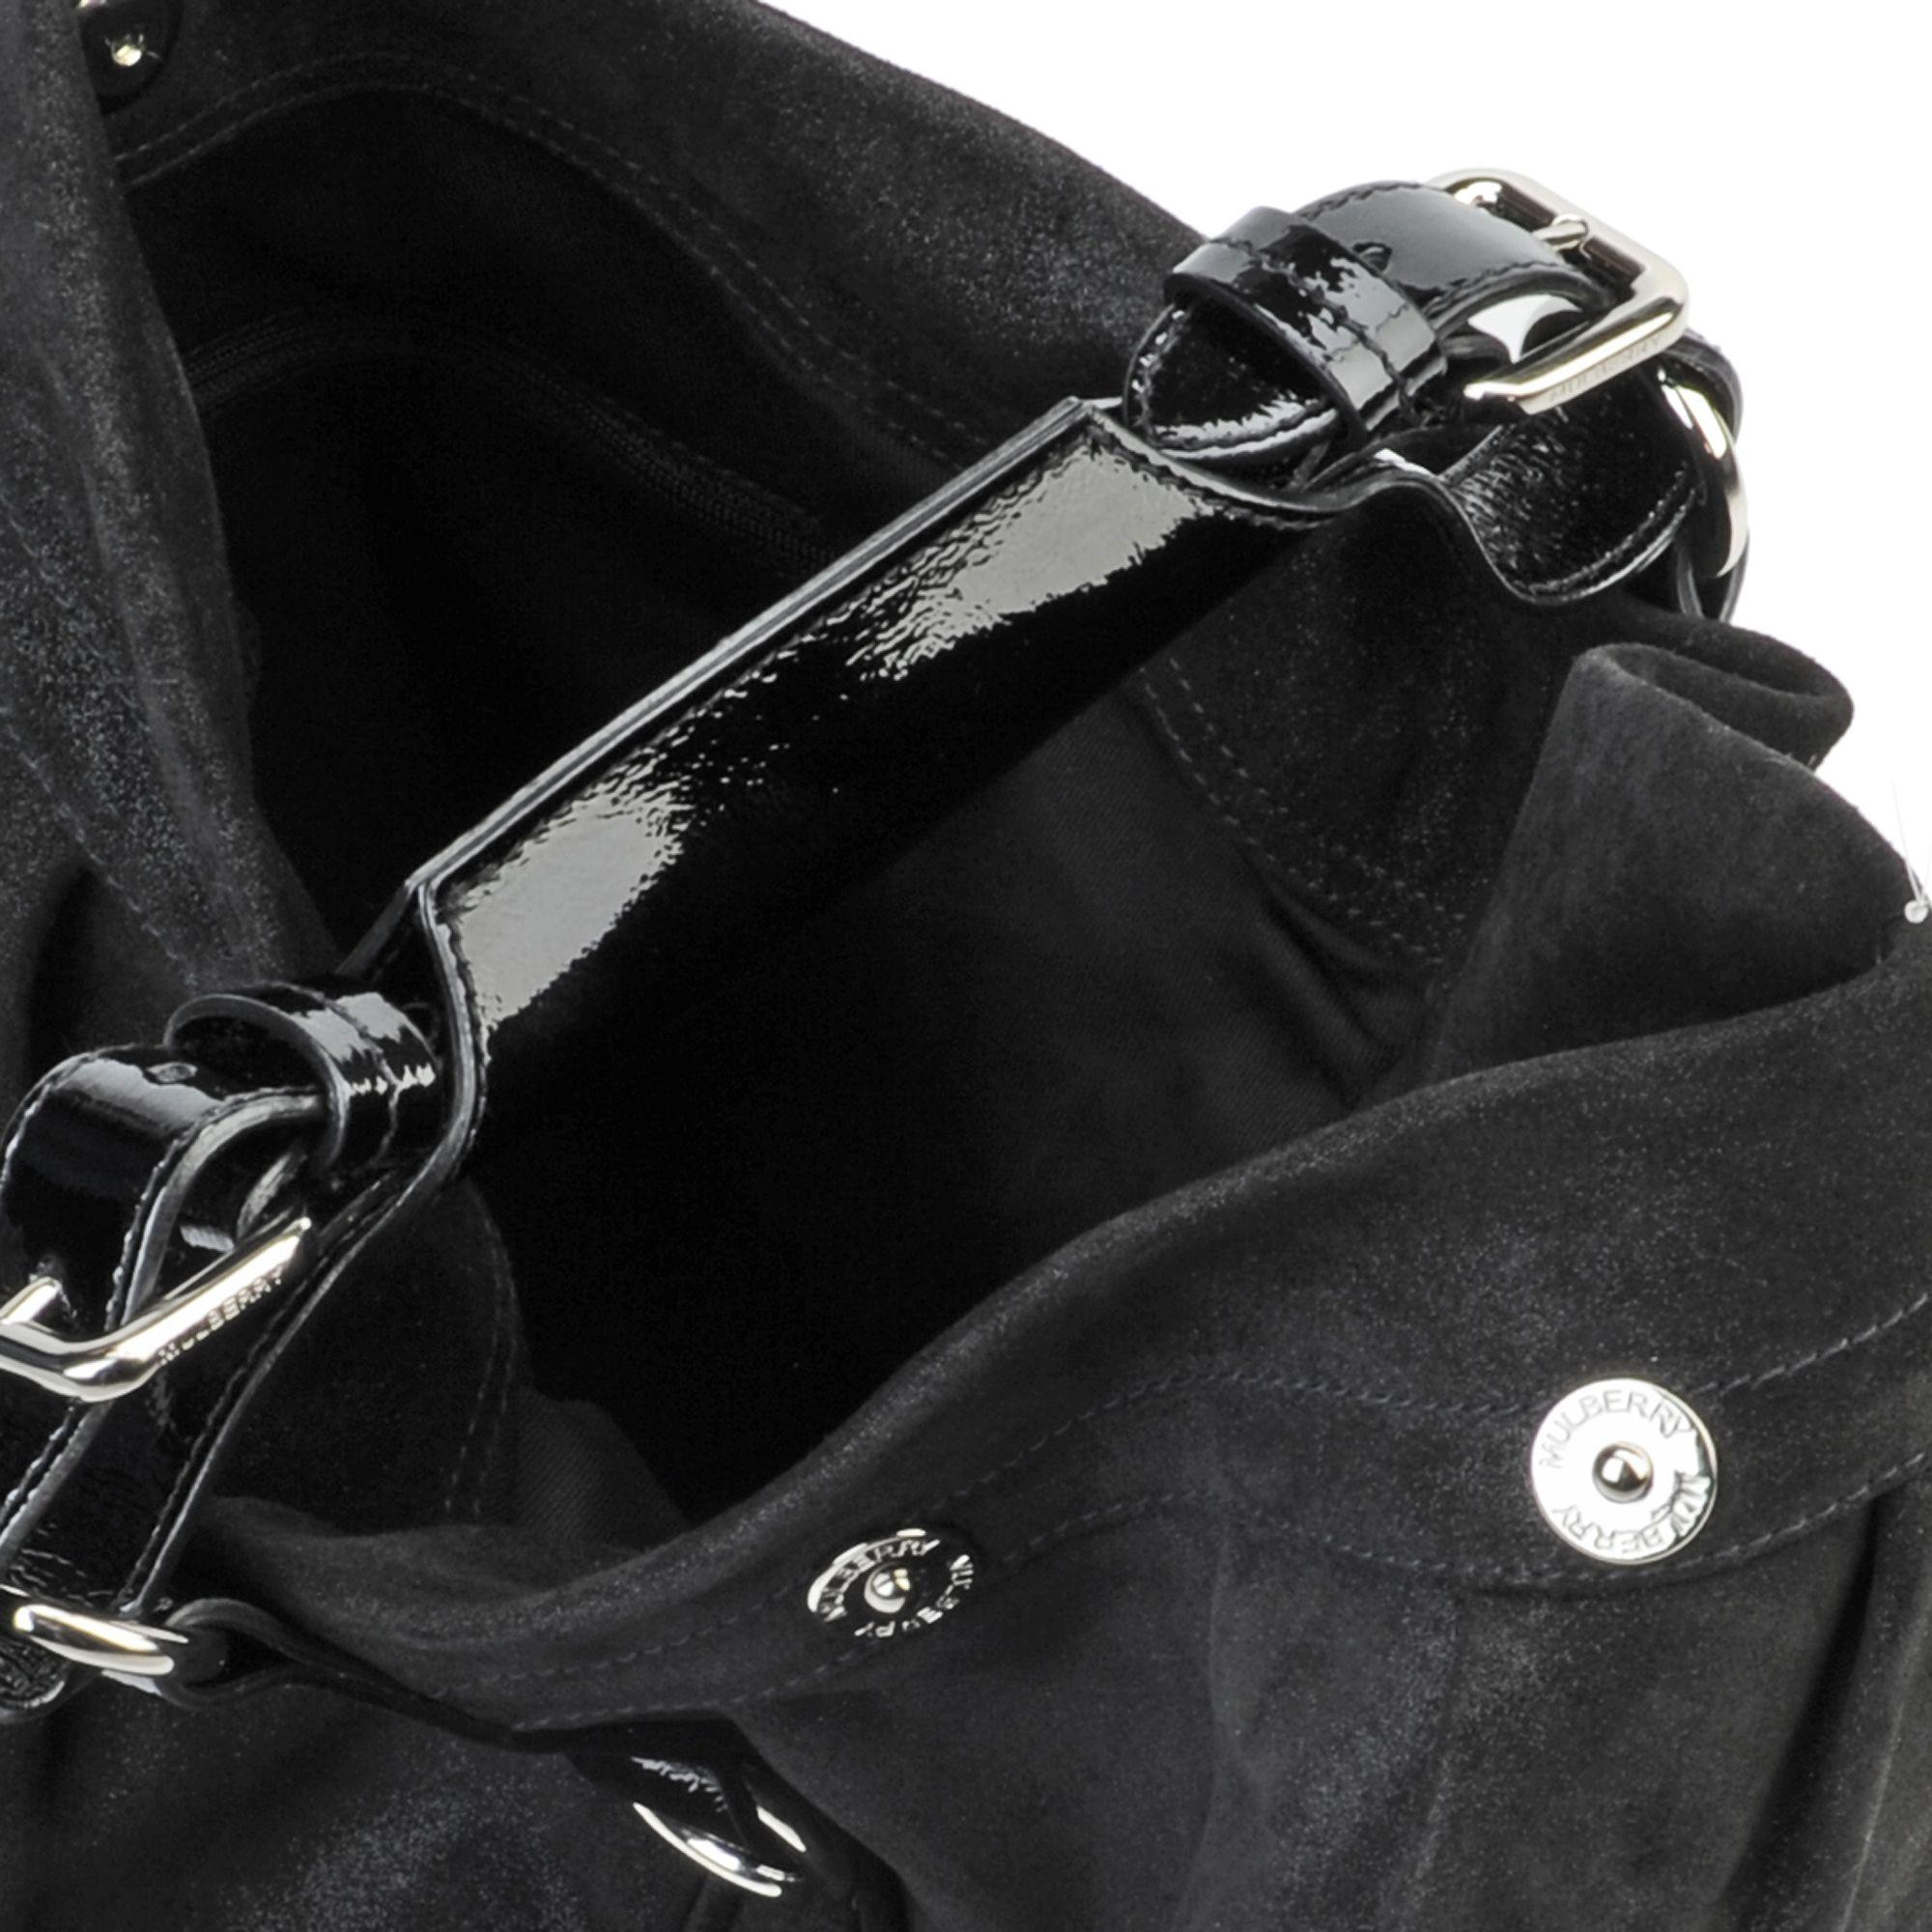 9e76de1dcf ... canada mulberry mitzy hobo sparkle bag in black lyst 65929 1d9a7 ...